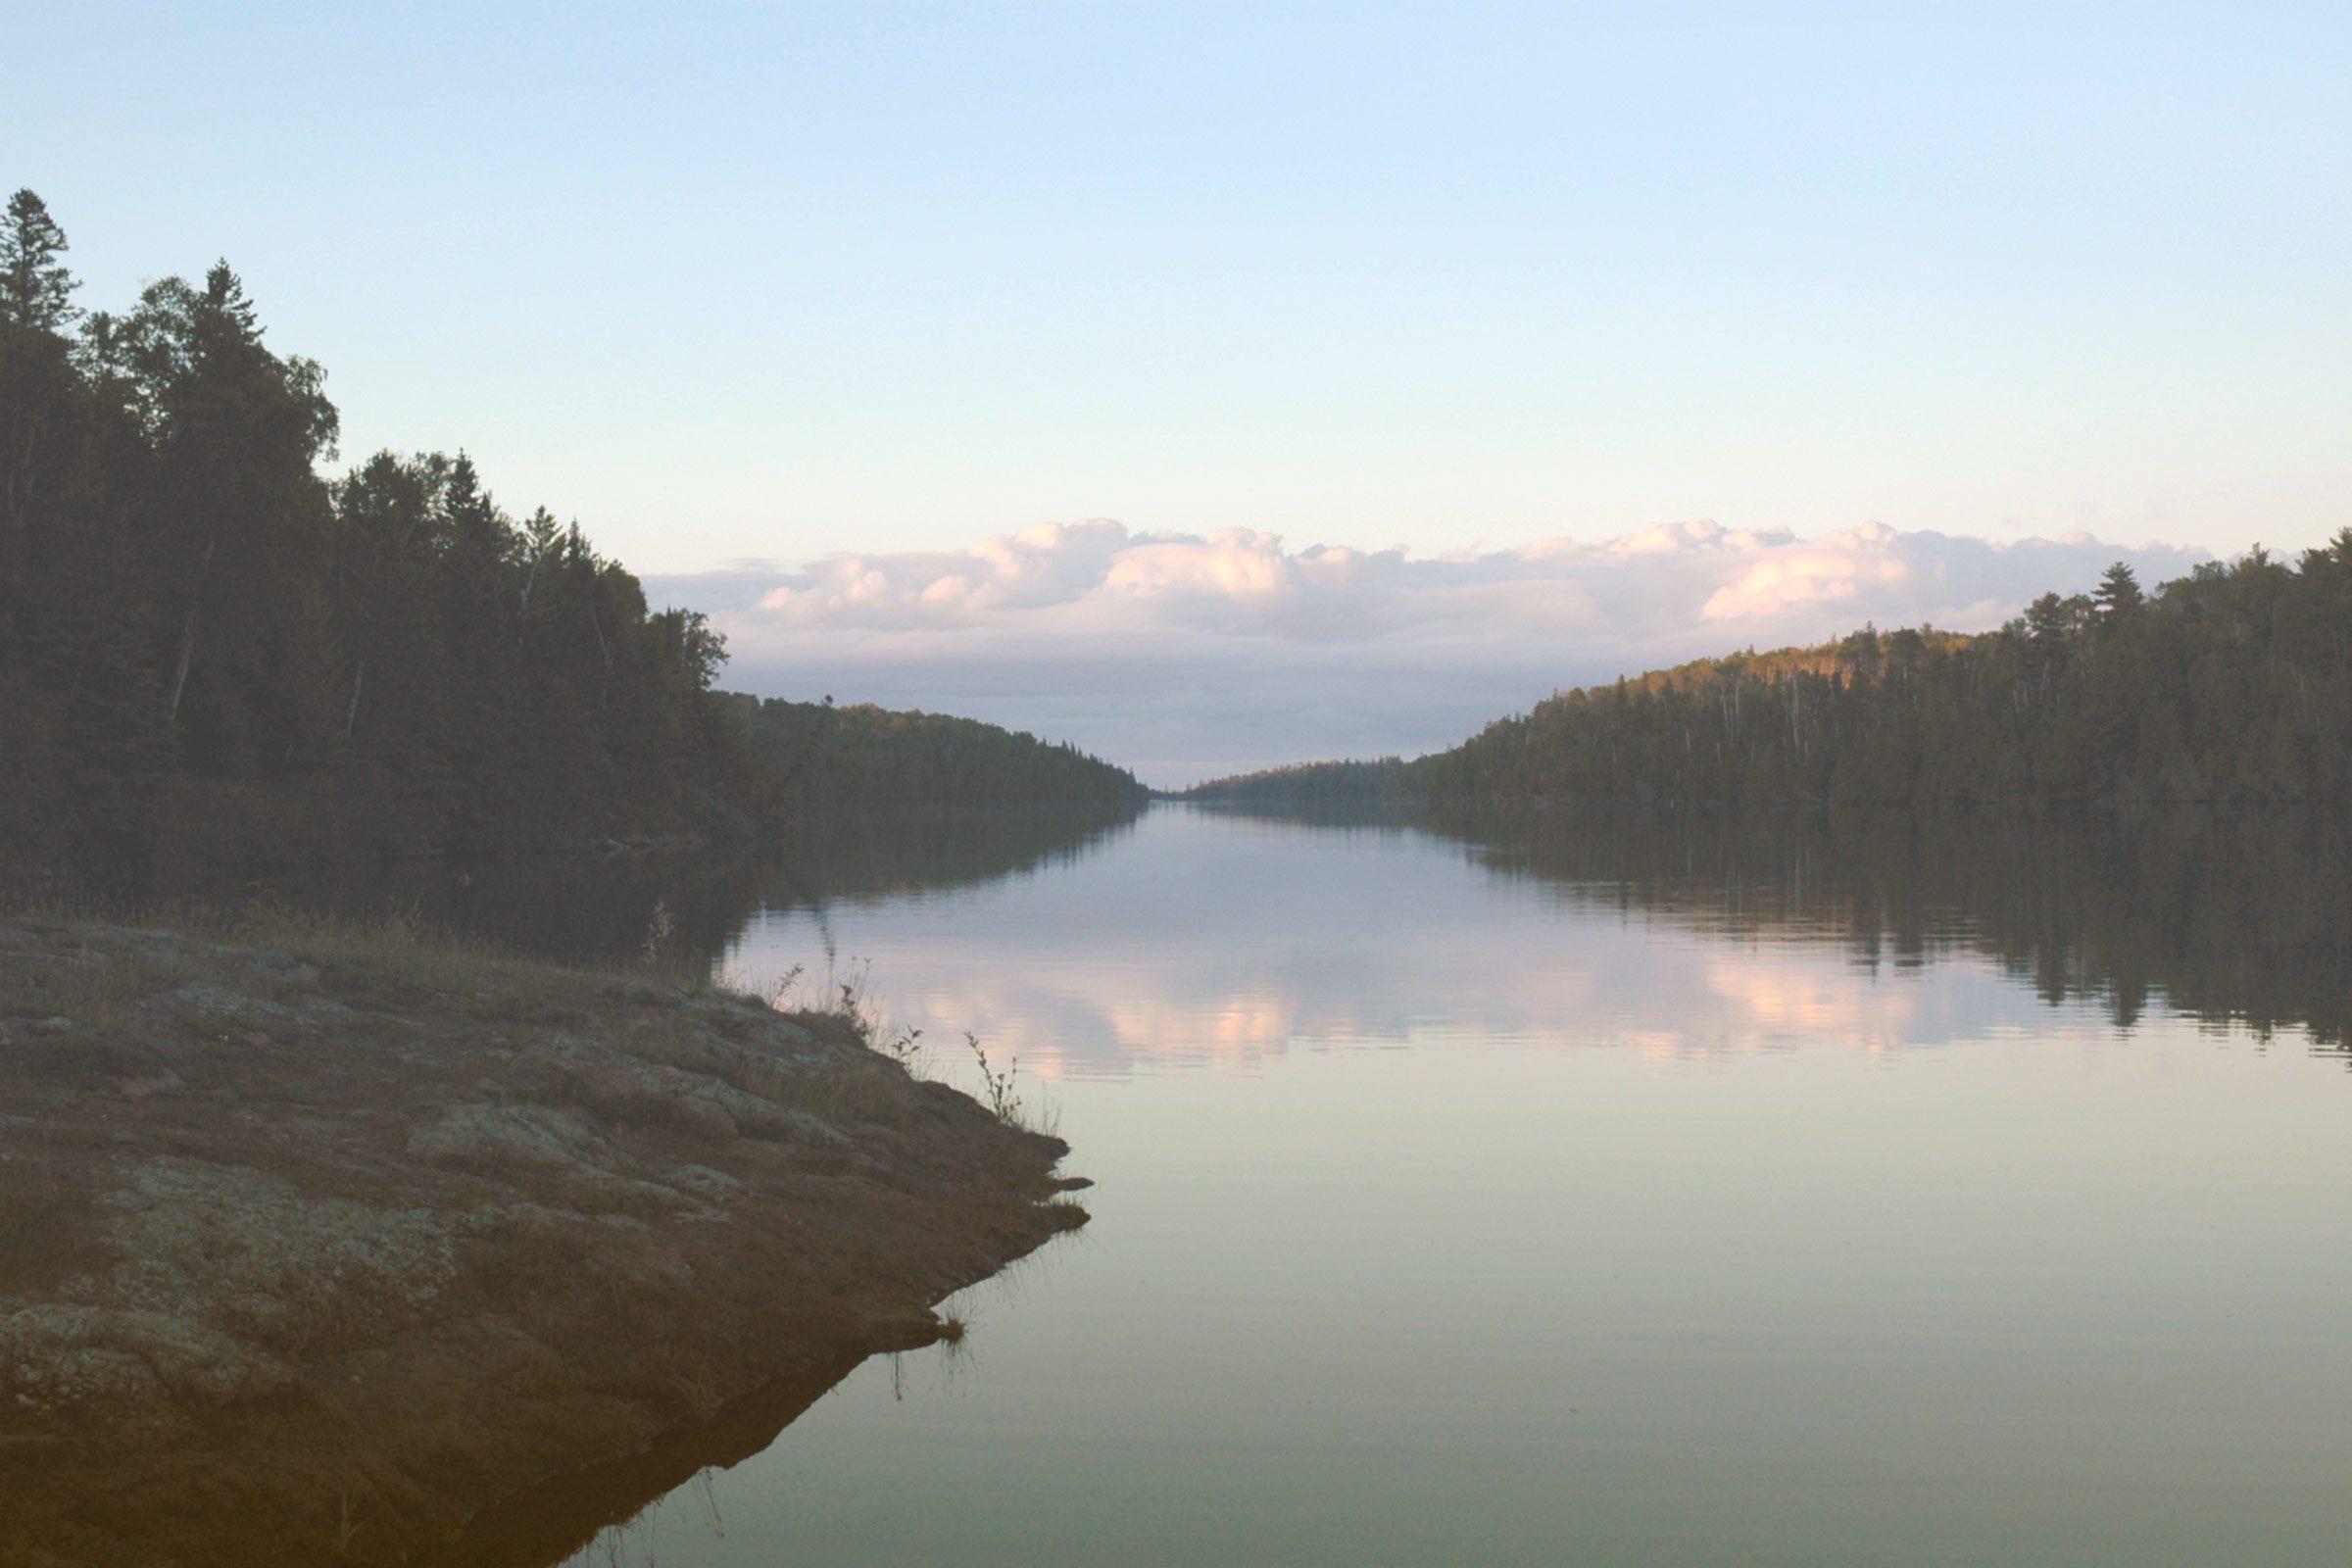 Talk about a Great Lake